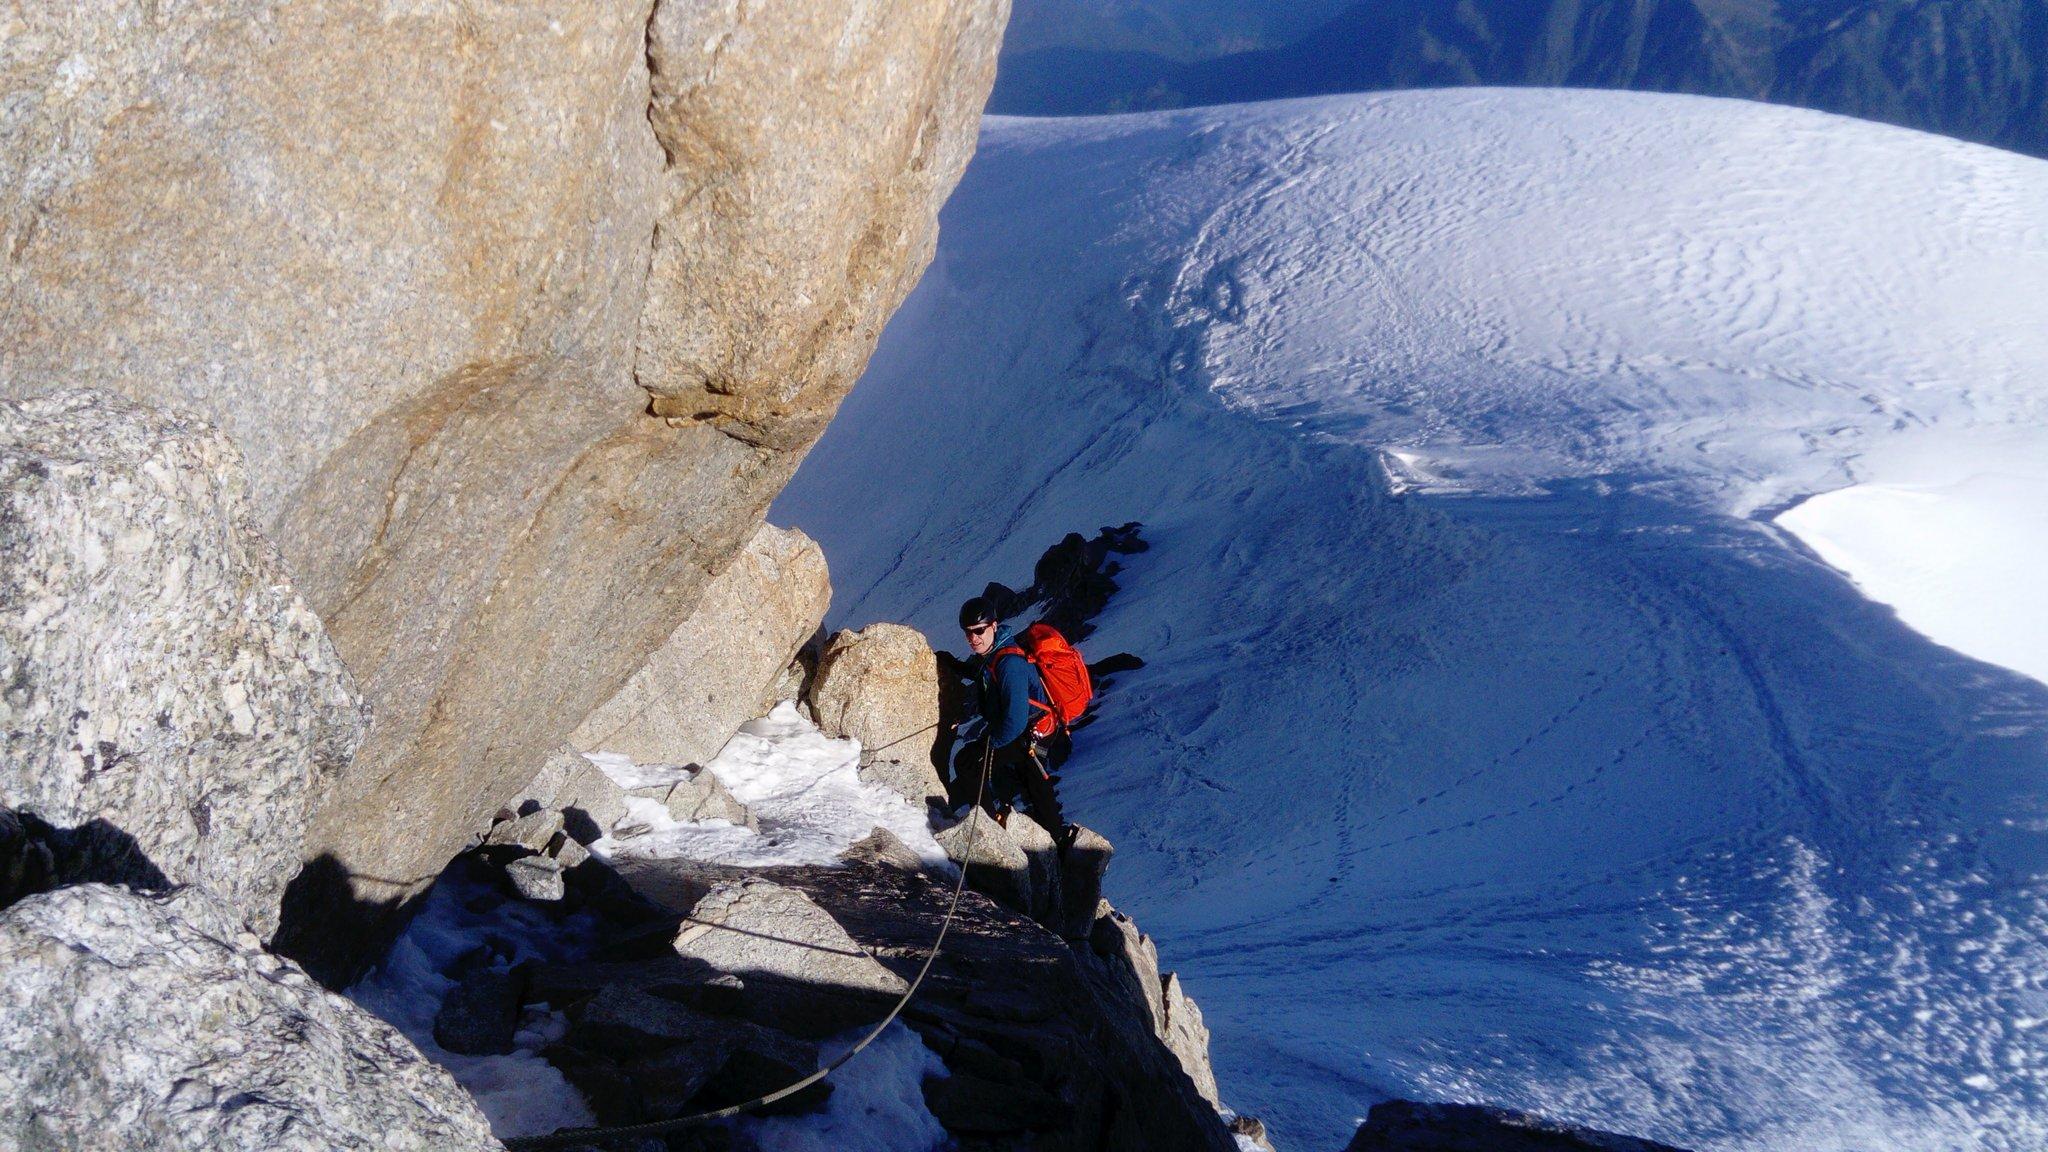 The summit rocks on Mont Blanc du Tacul